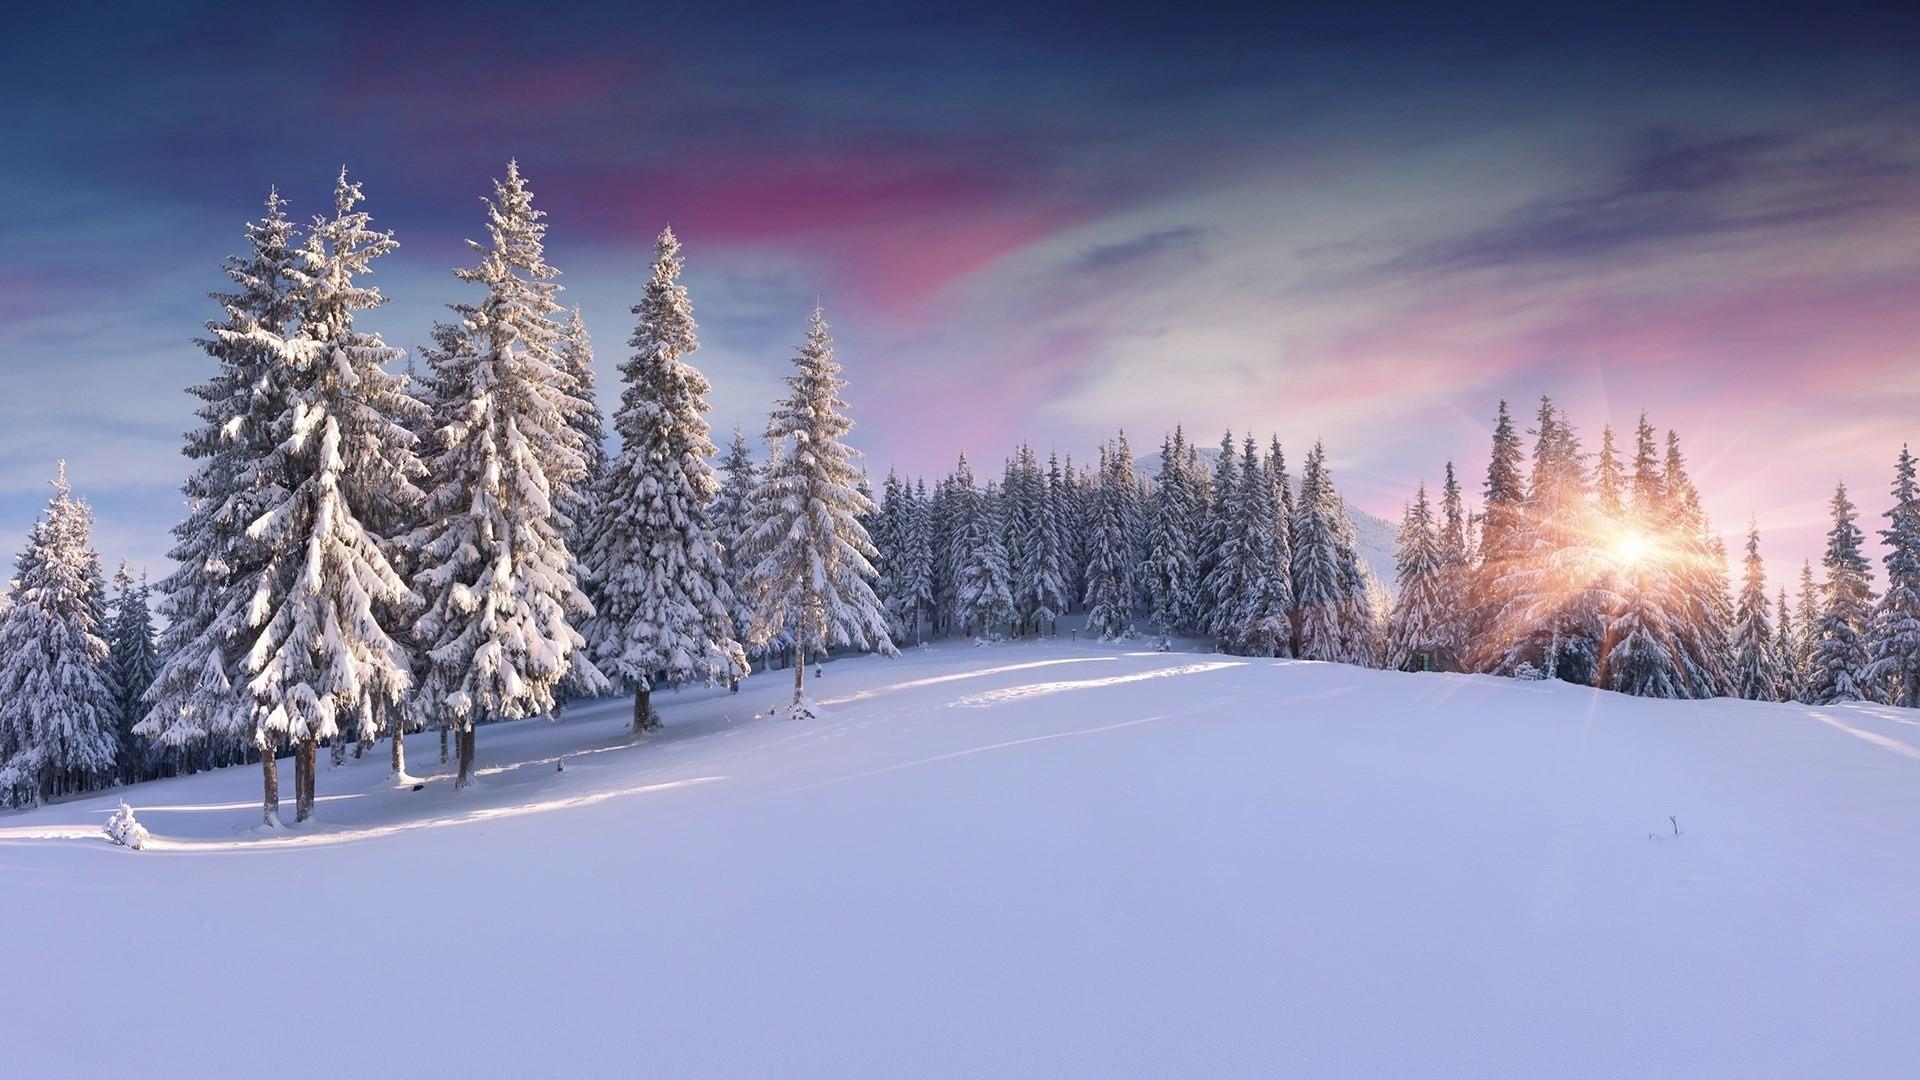 Windows spotlight wallpapers 99 images for Sfondi invernali desktop